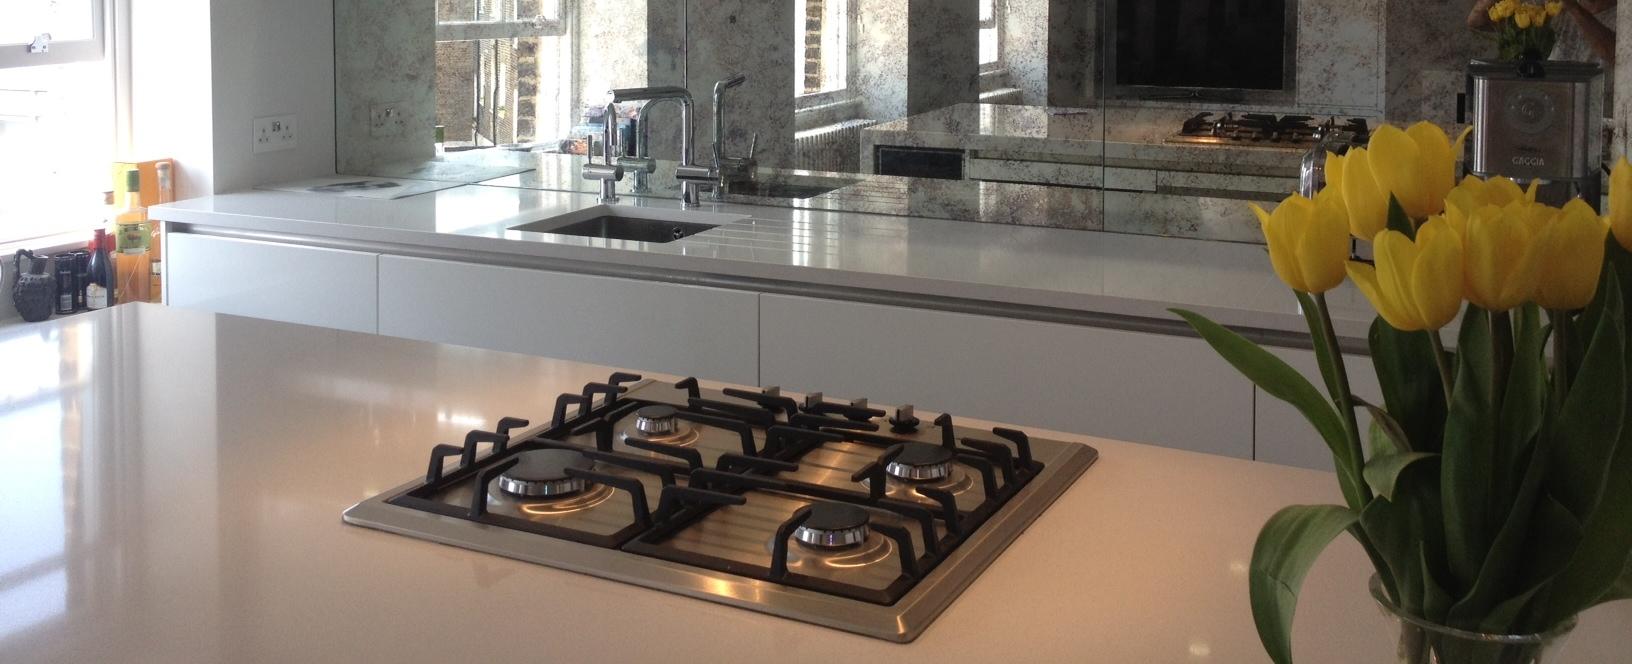 project-kitchen-splashback.jpg